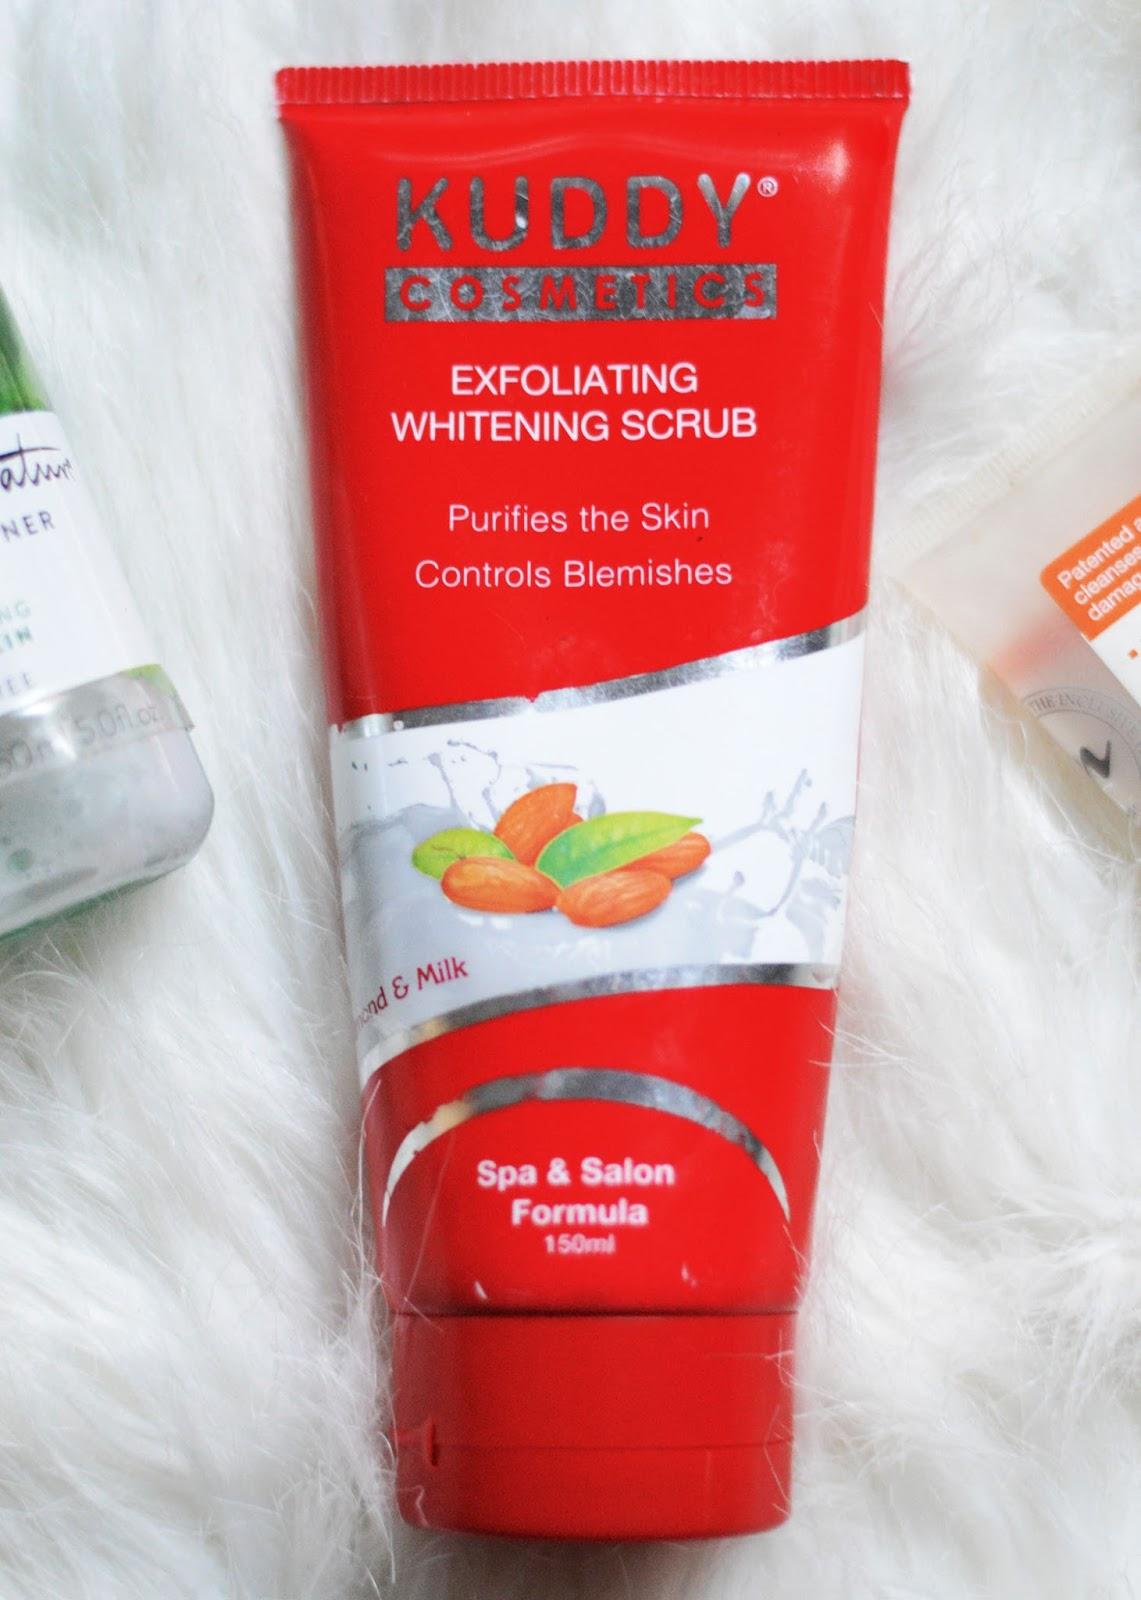 Kuddy_cosmetics_exfoliating_whitening_scrub